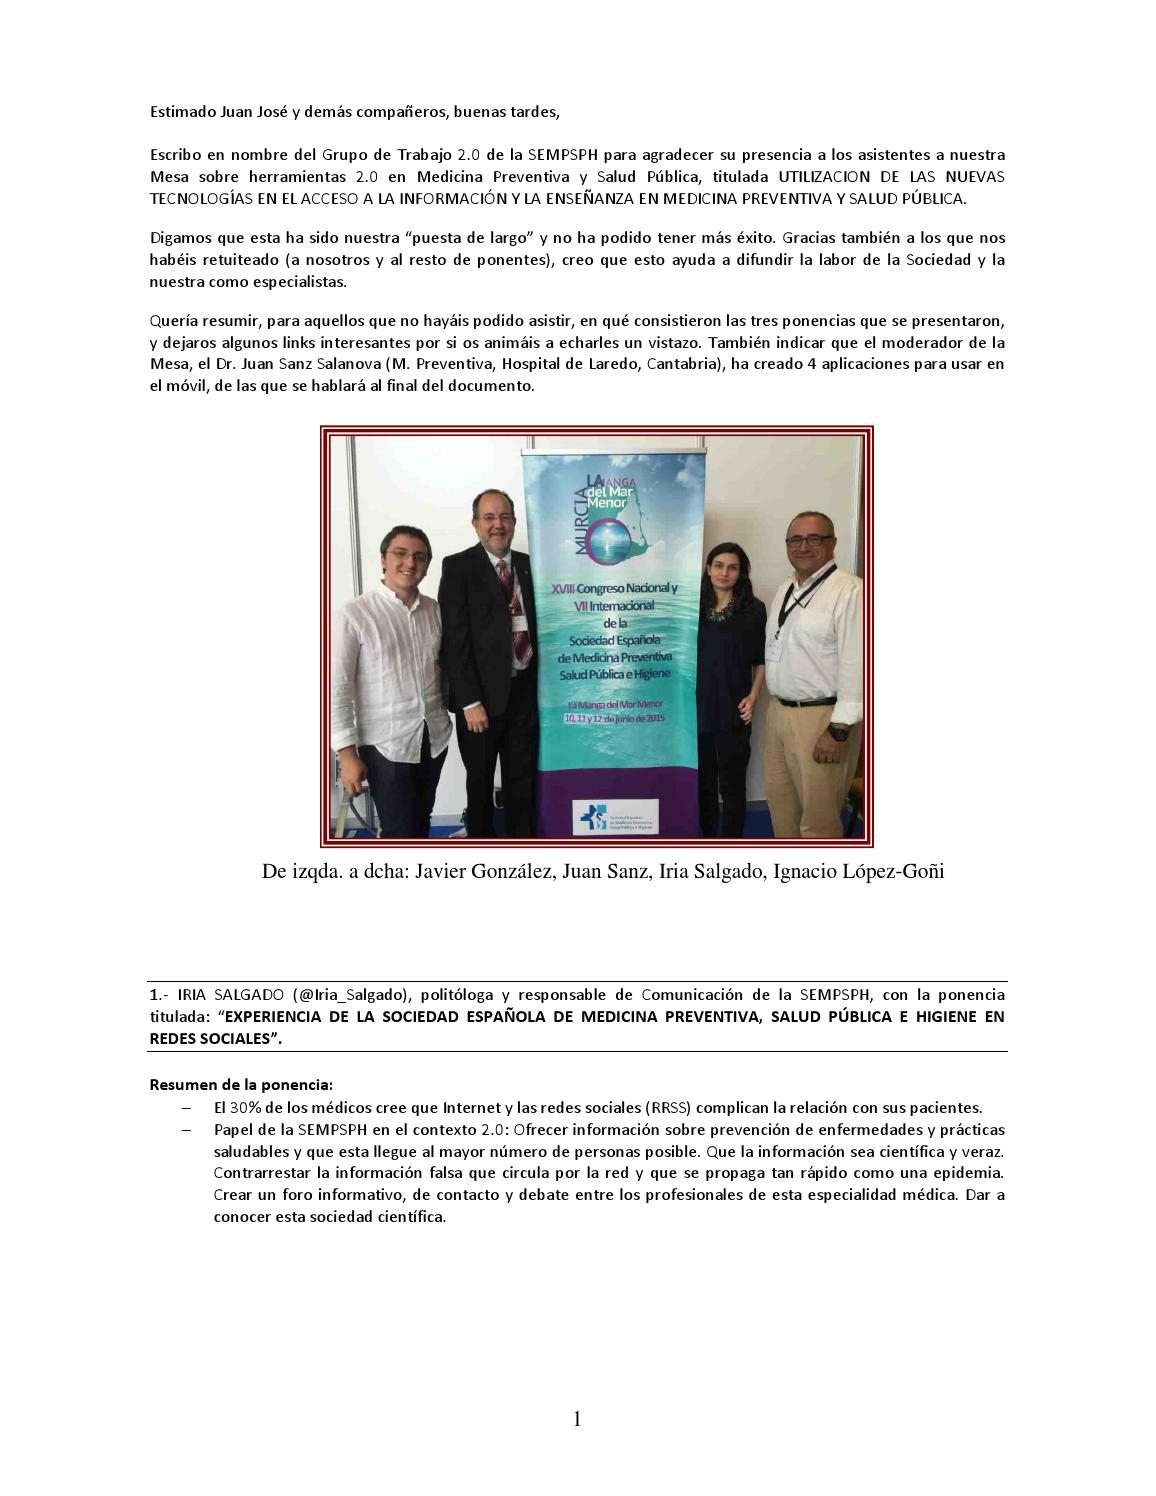 Resumen Ponencia SEMPSPH 2.0 by Juan Antonio Sanz Salanova - issuu